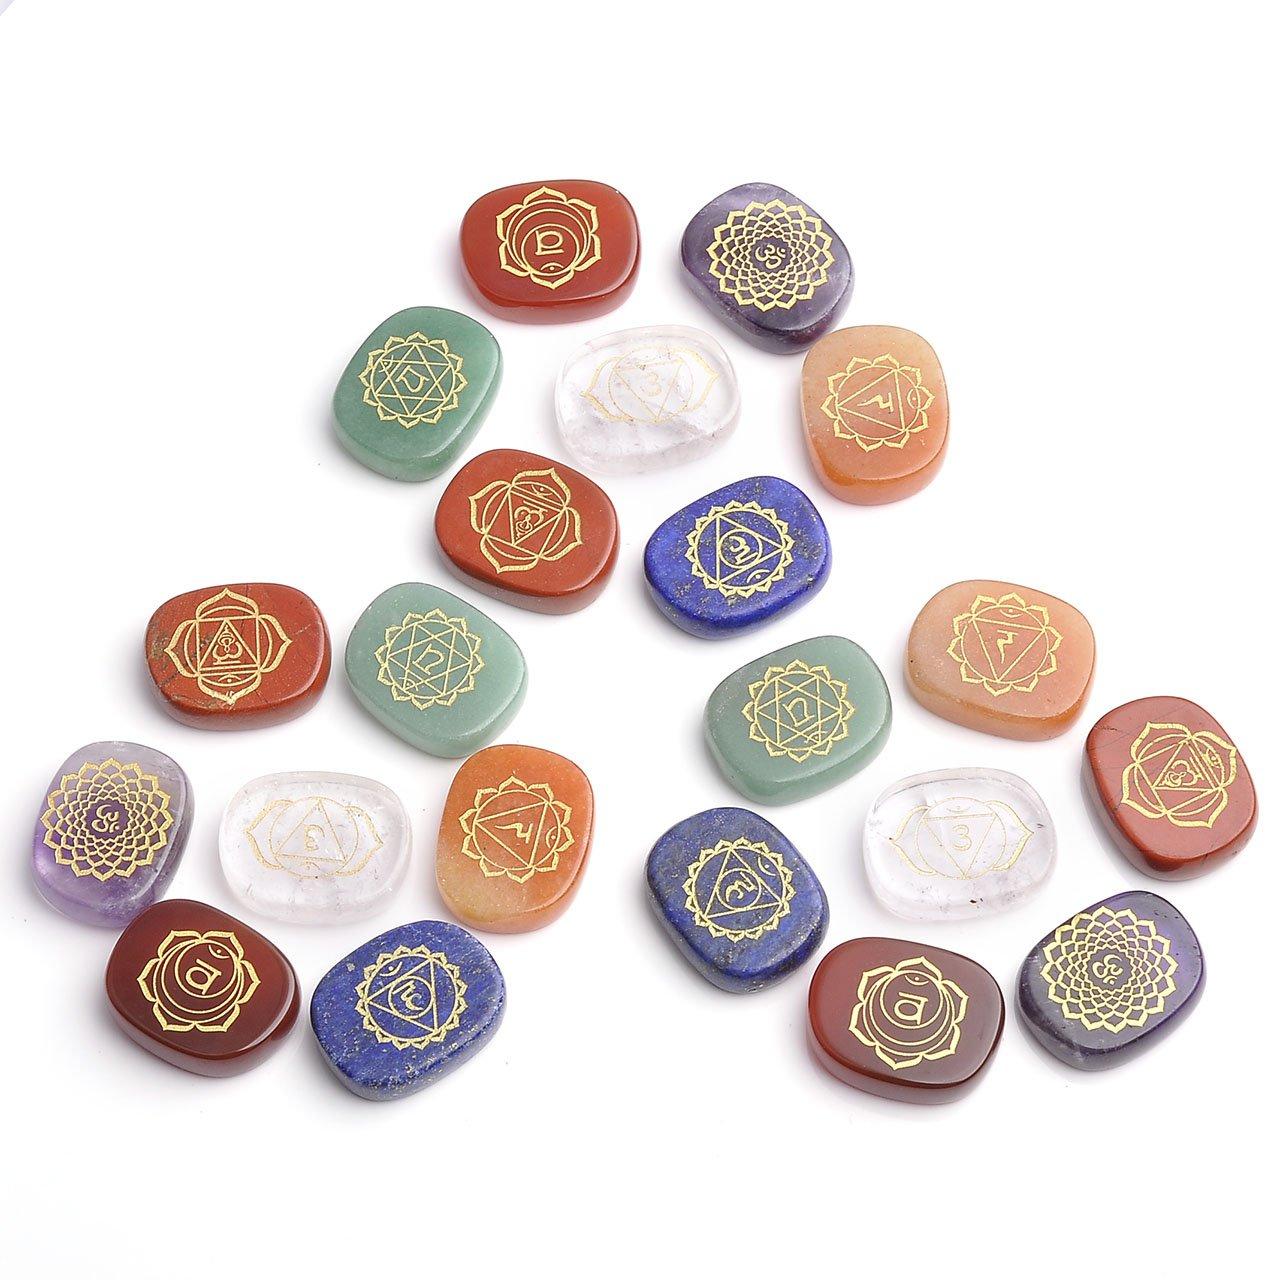 Jovivi 7 Chakra Gemstone Oval Symbol Feng Shui Healing Reiki Stones